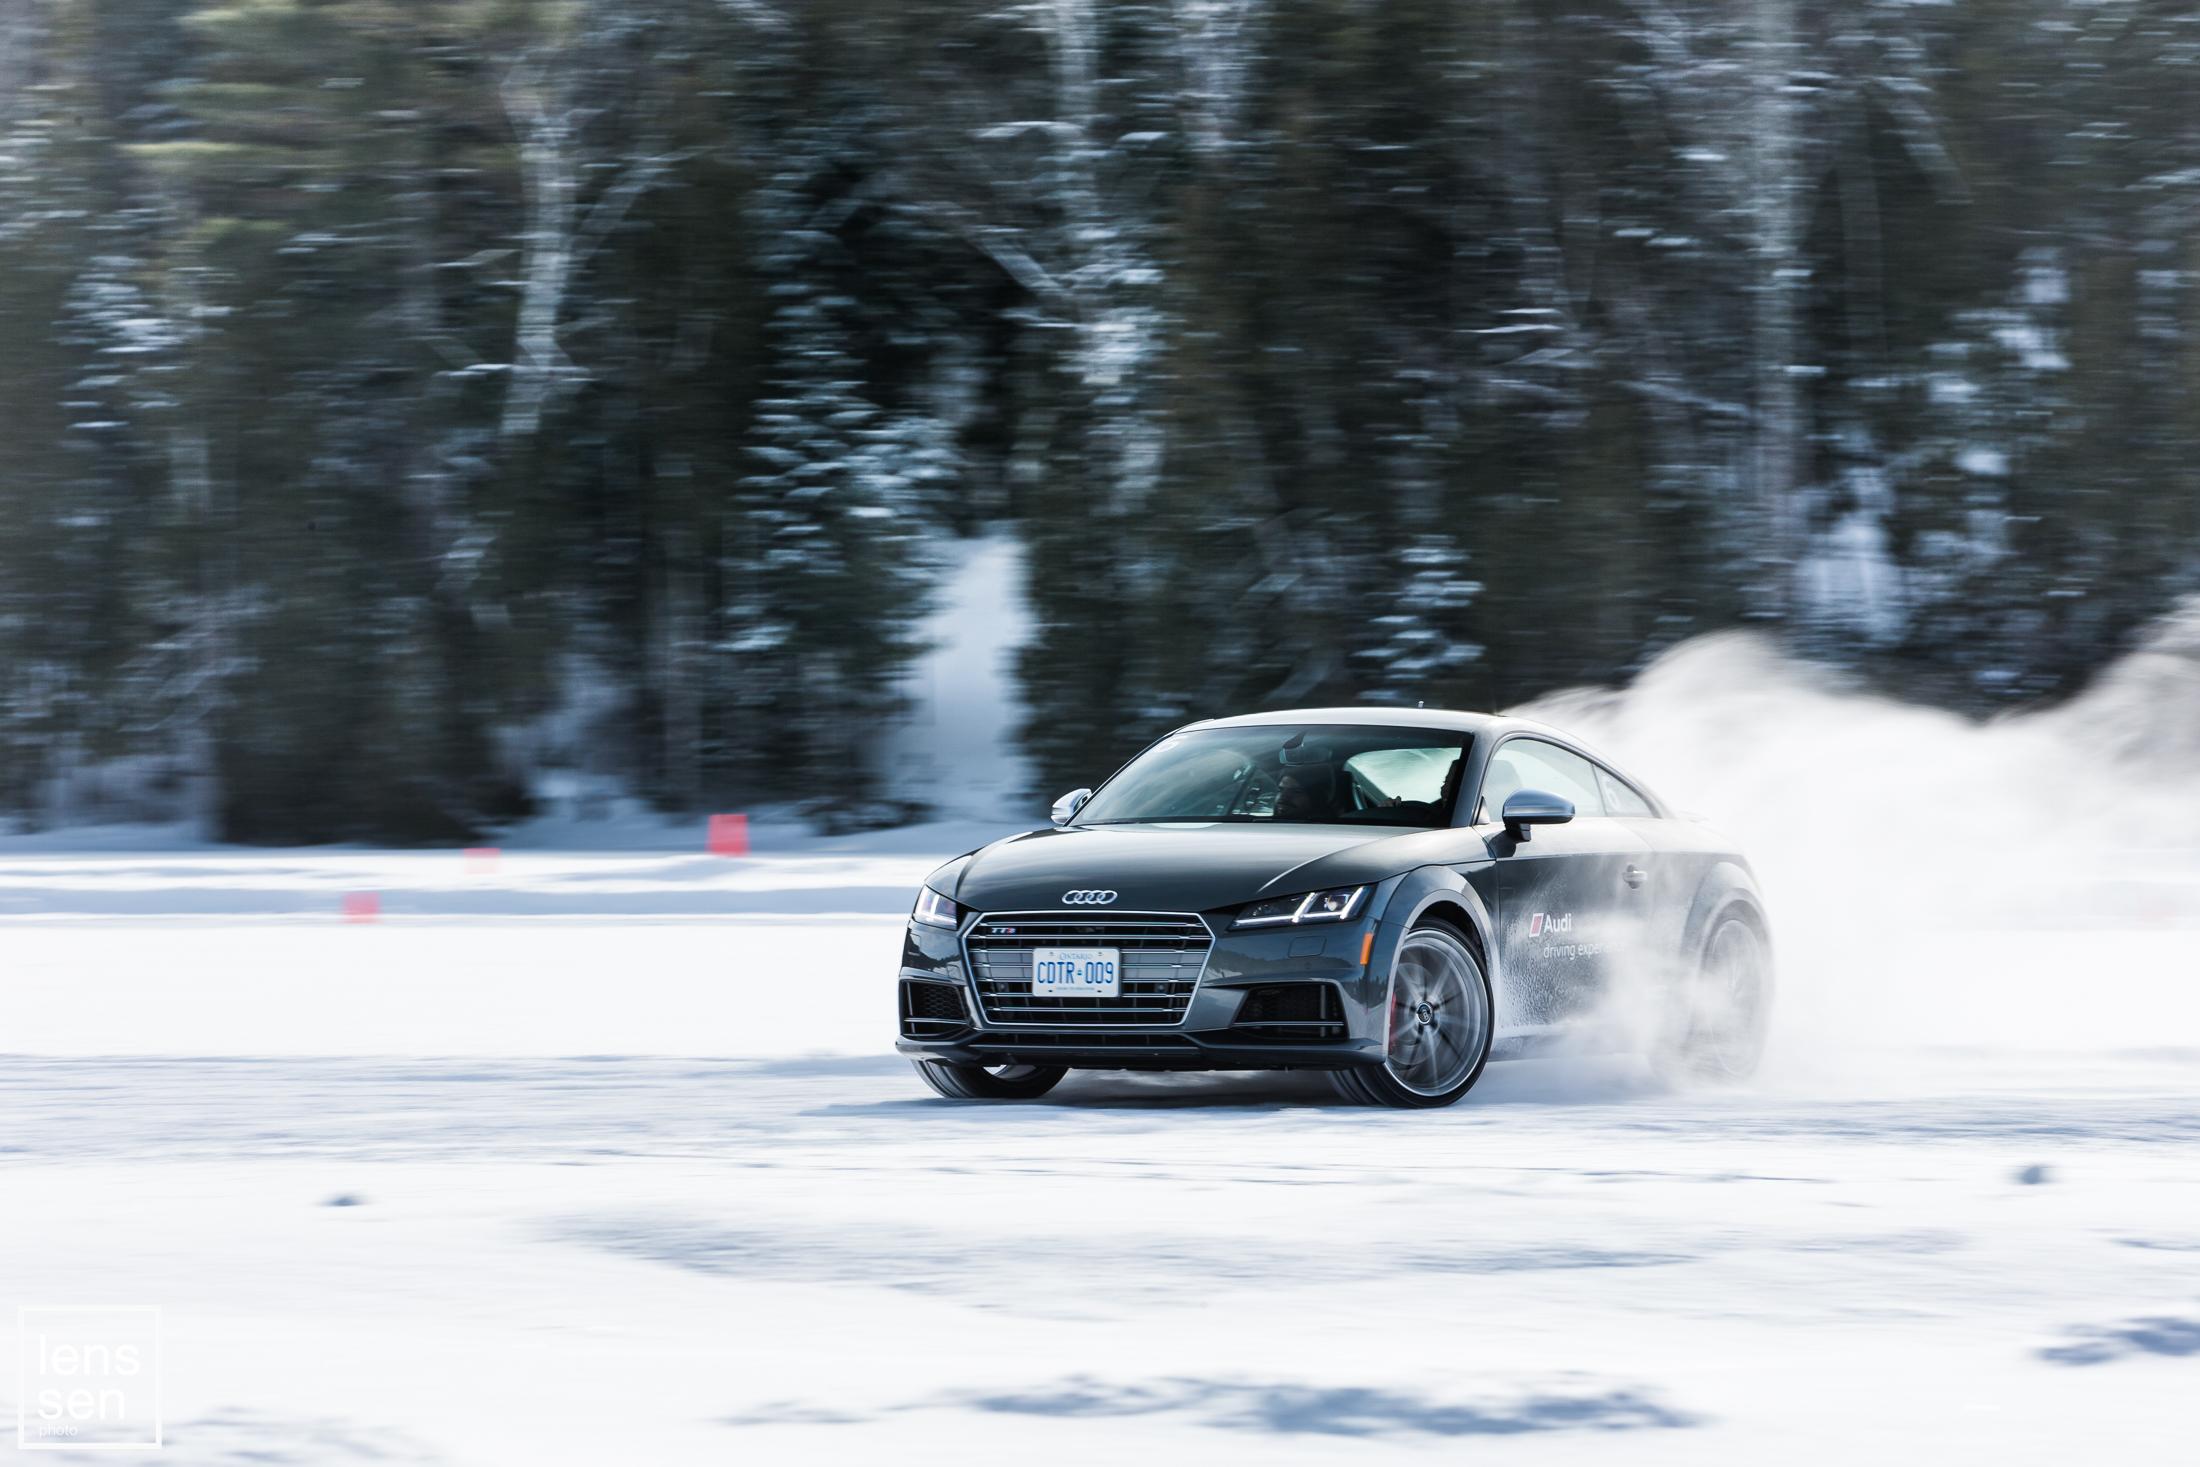 Audi Ice Experience - Sacacomie QC - Feb 2018 - 44 -2506.jpg